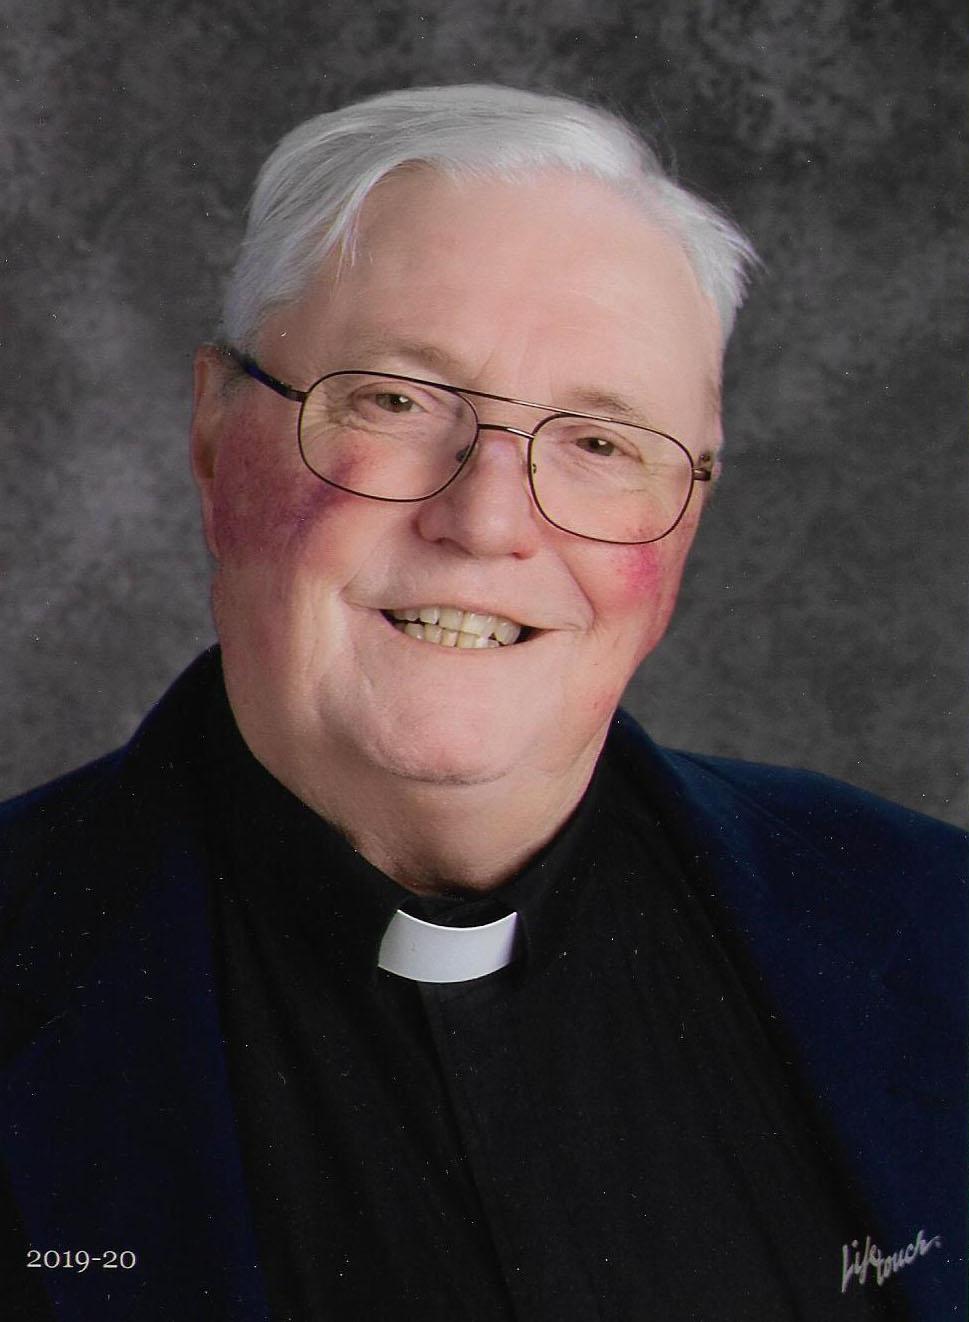 Father Peter J. Reynierse